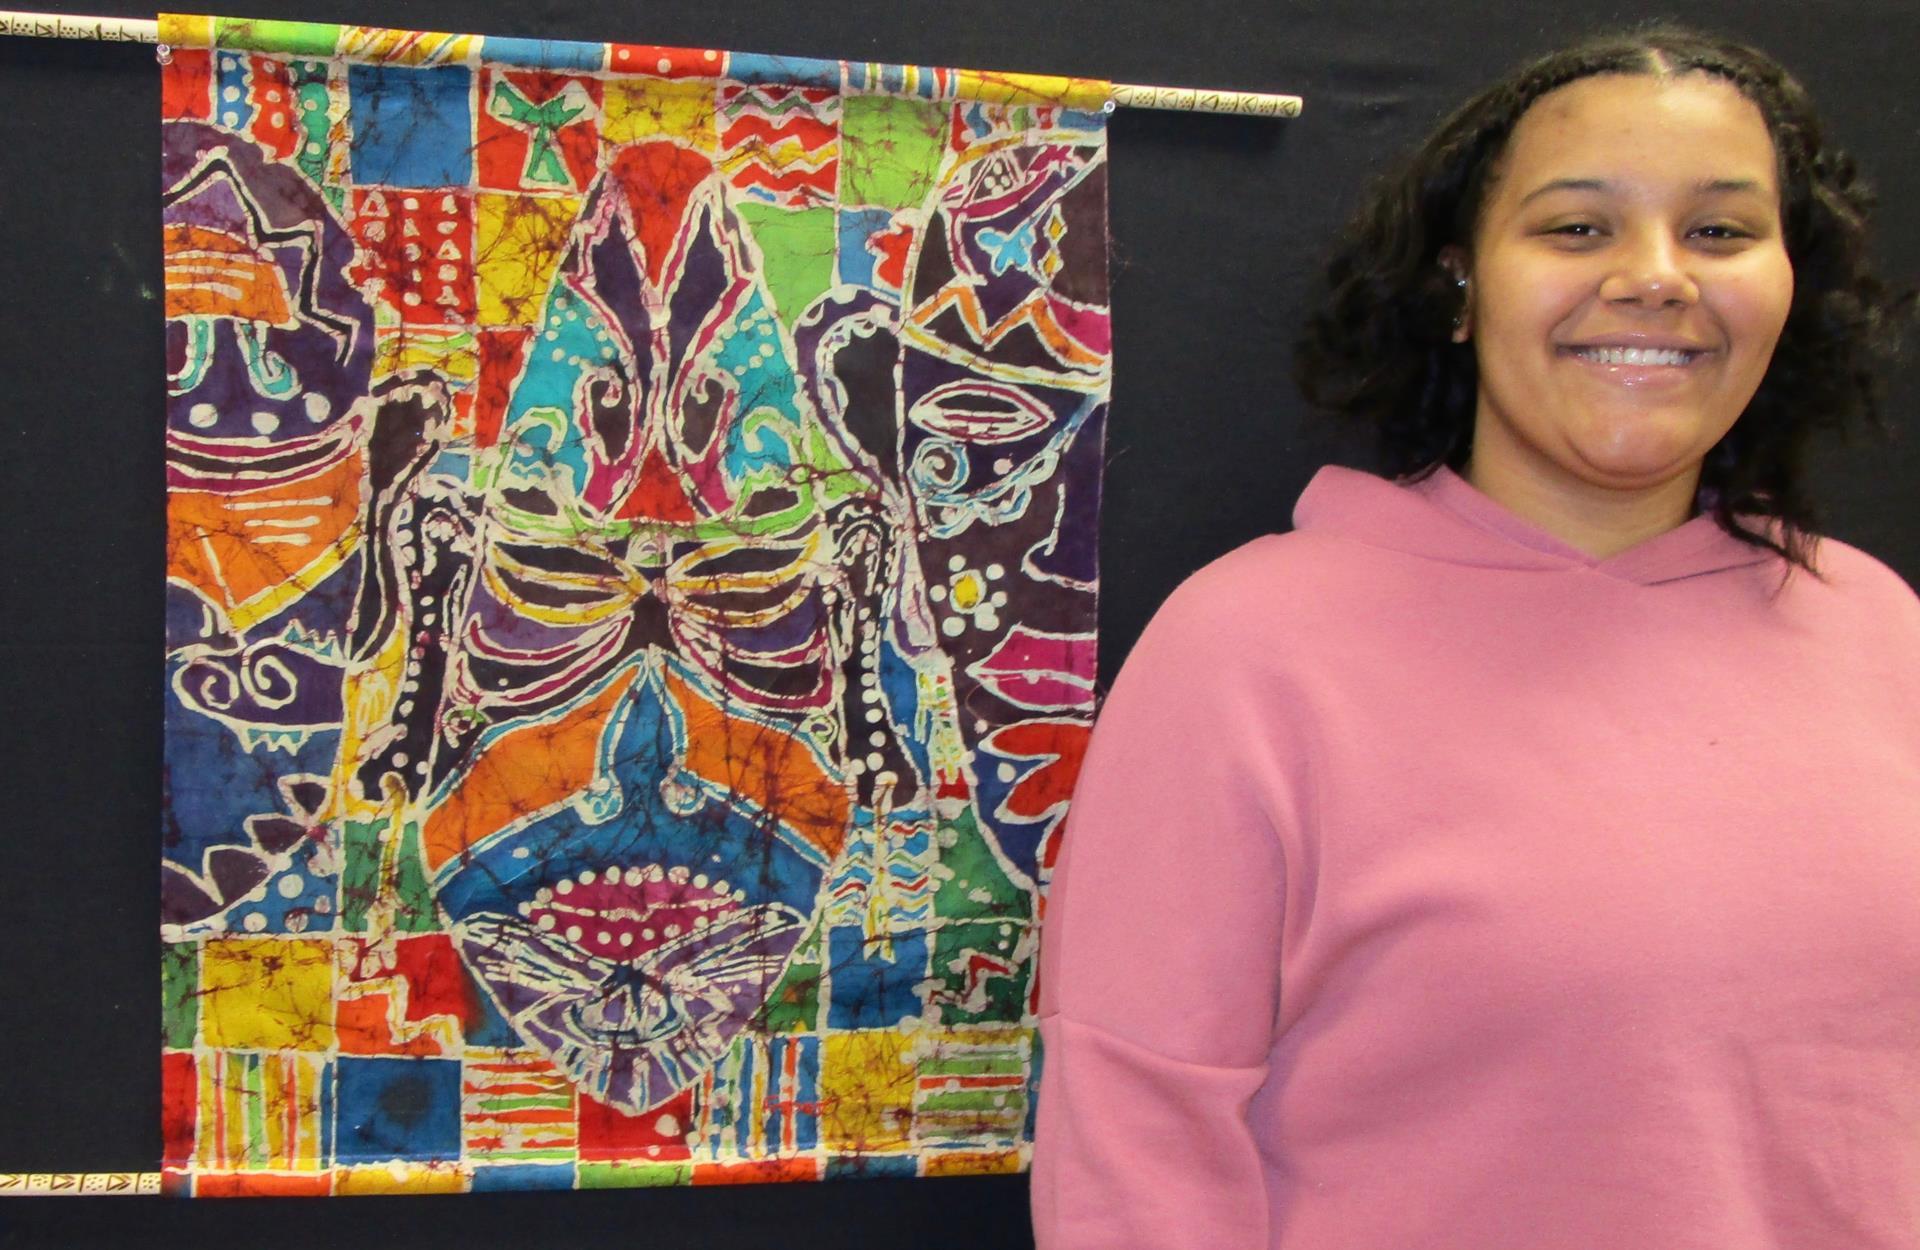 Student Freddi King and artwork